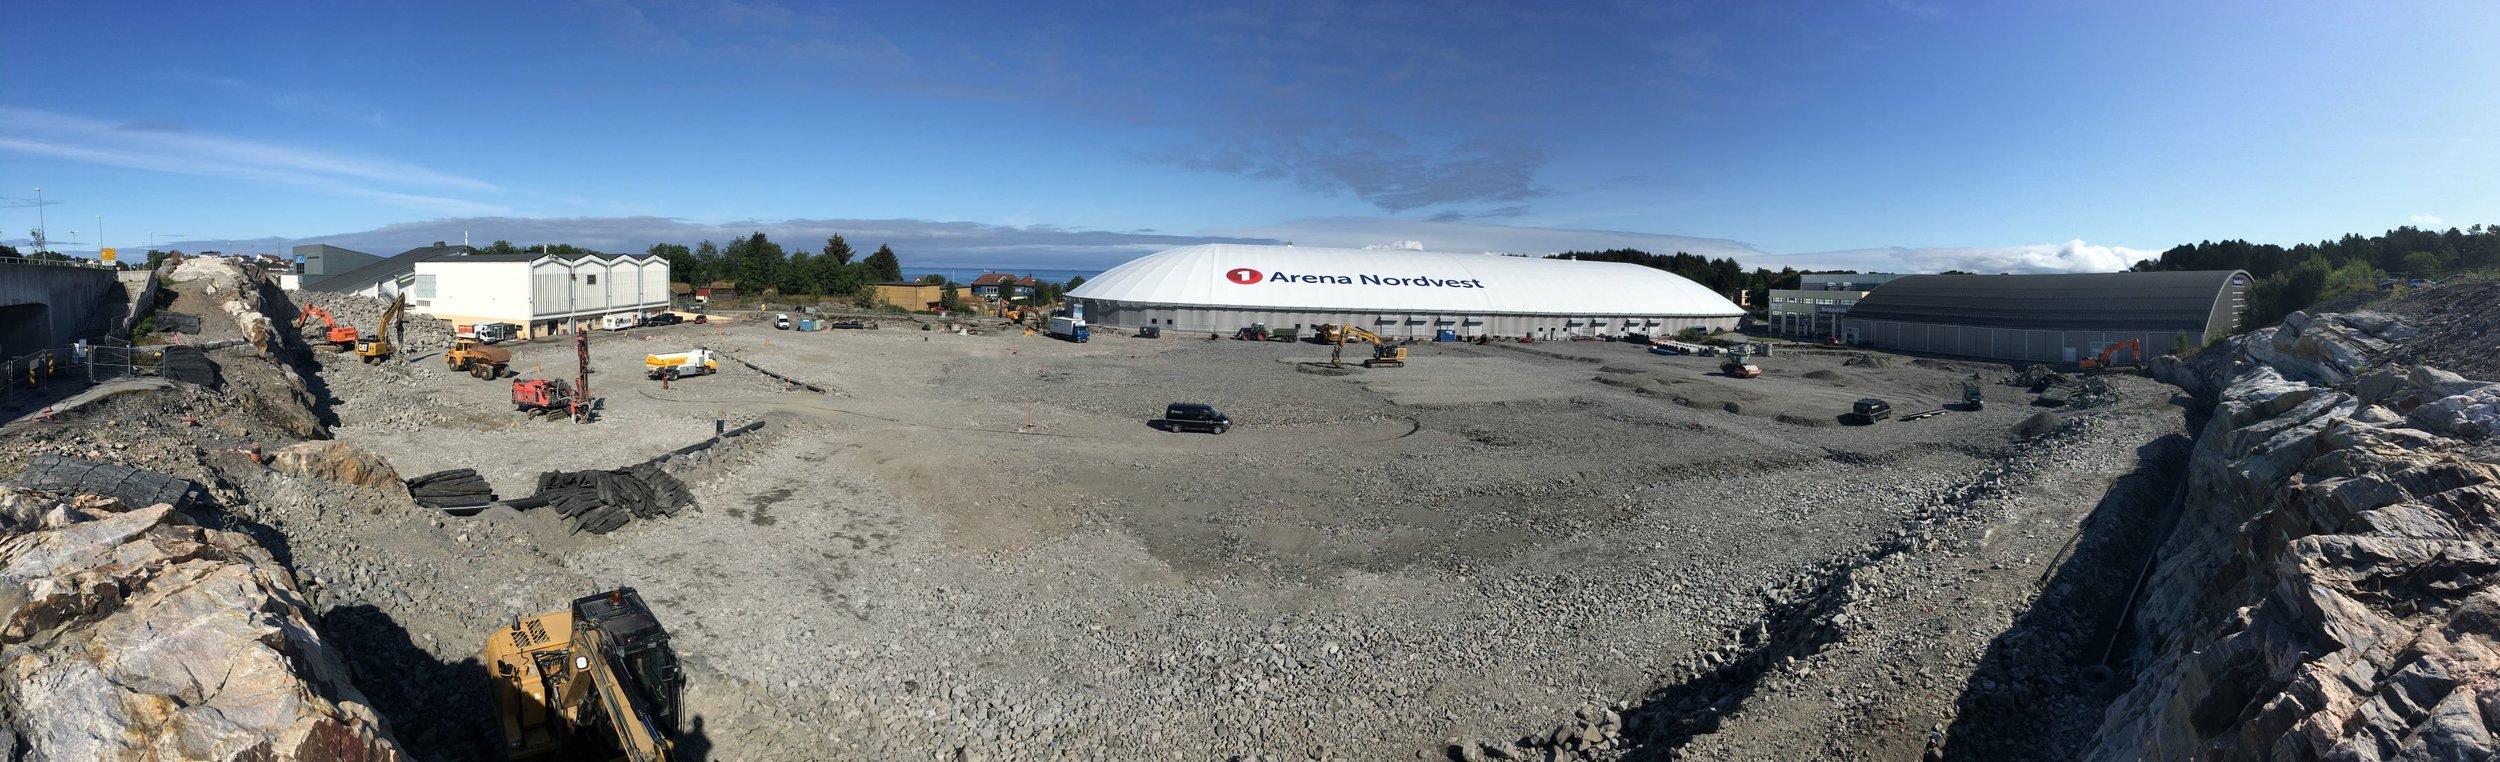 090819 panorama.JPG